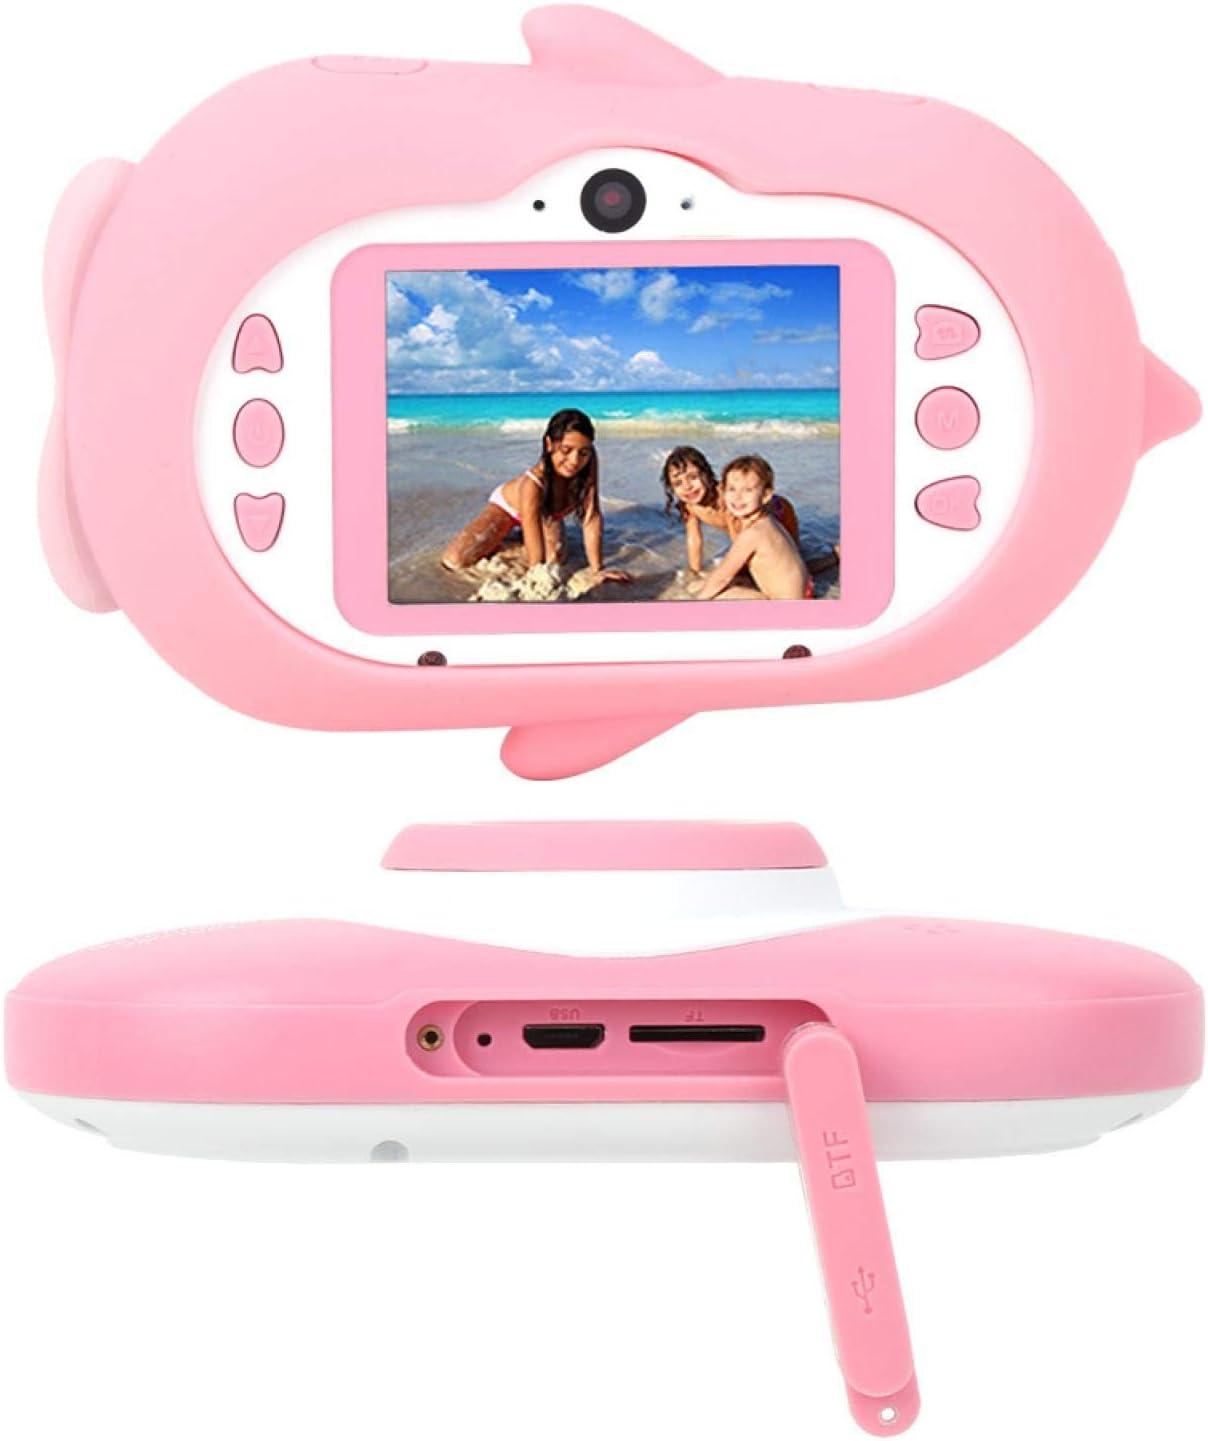 3M Waterproof IPS Screen 2.4 Inch Digital New Free Shipping Camera Suppor Japan Maker New Children